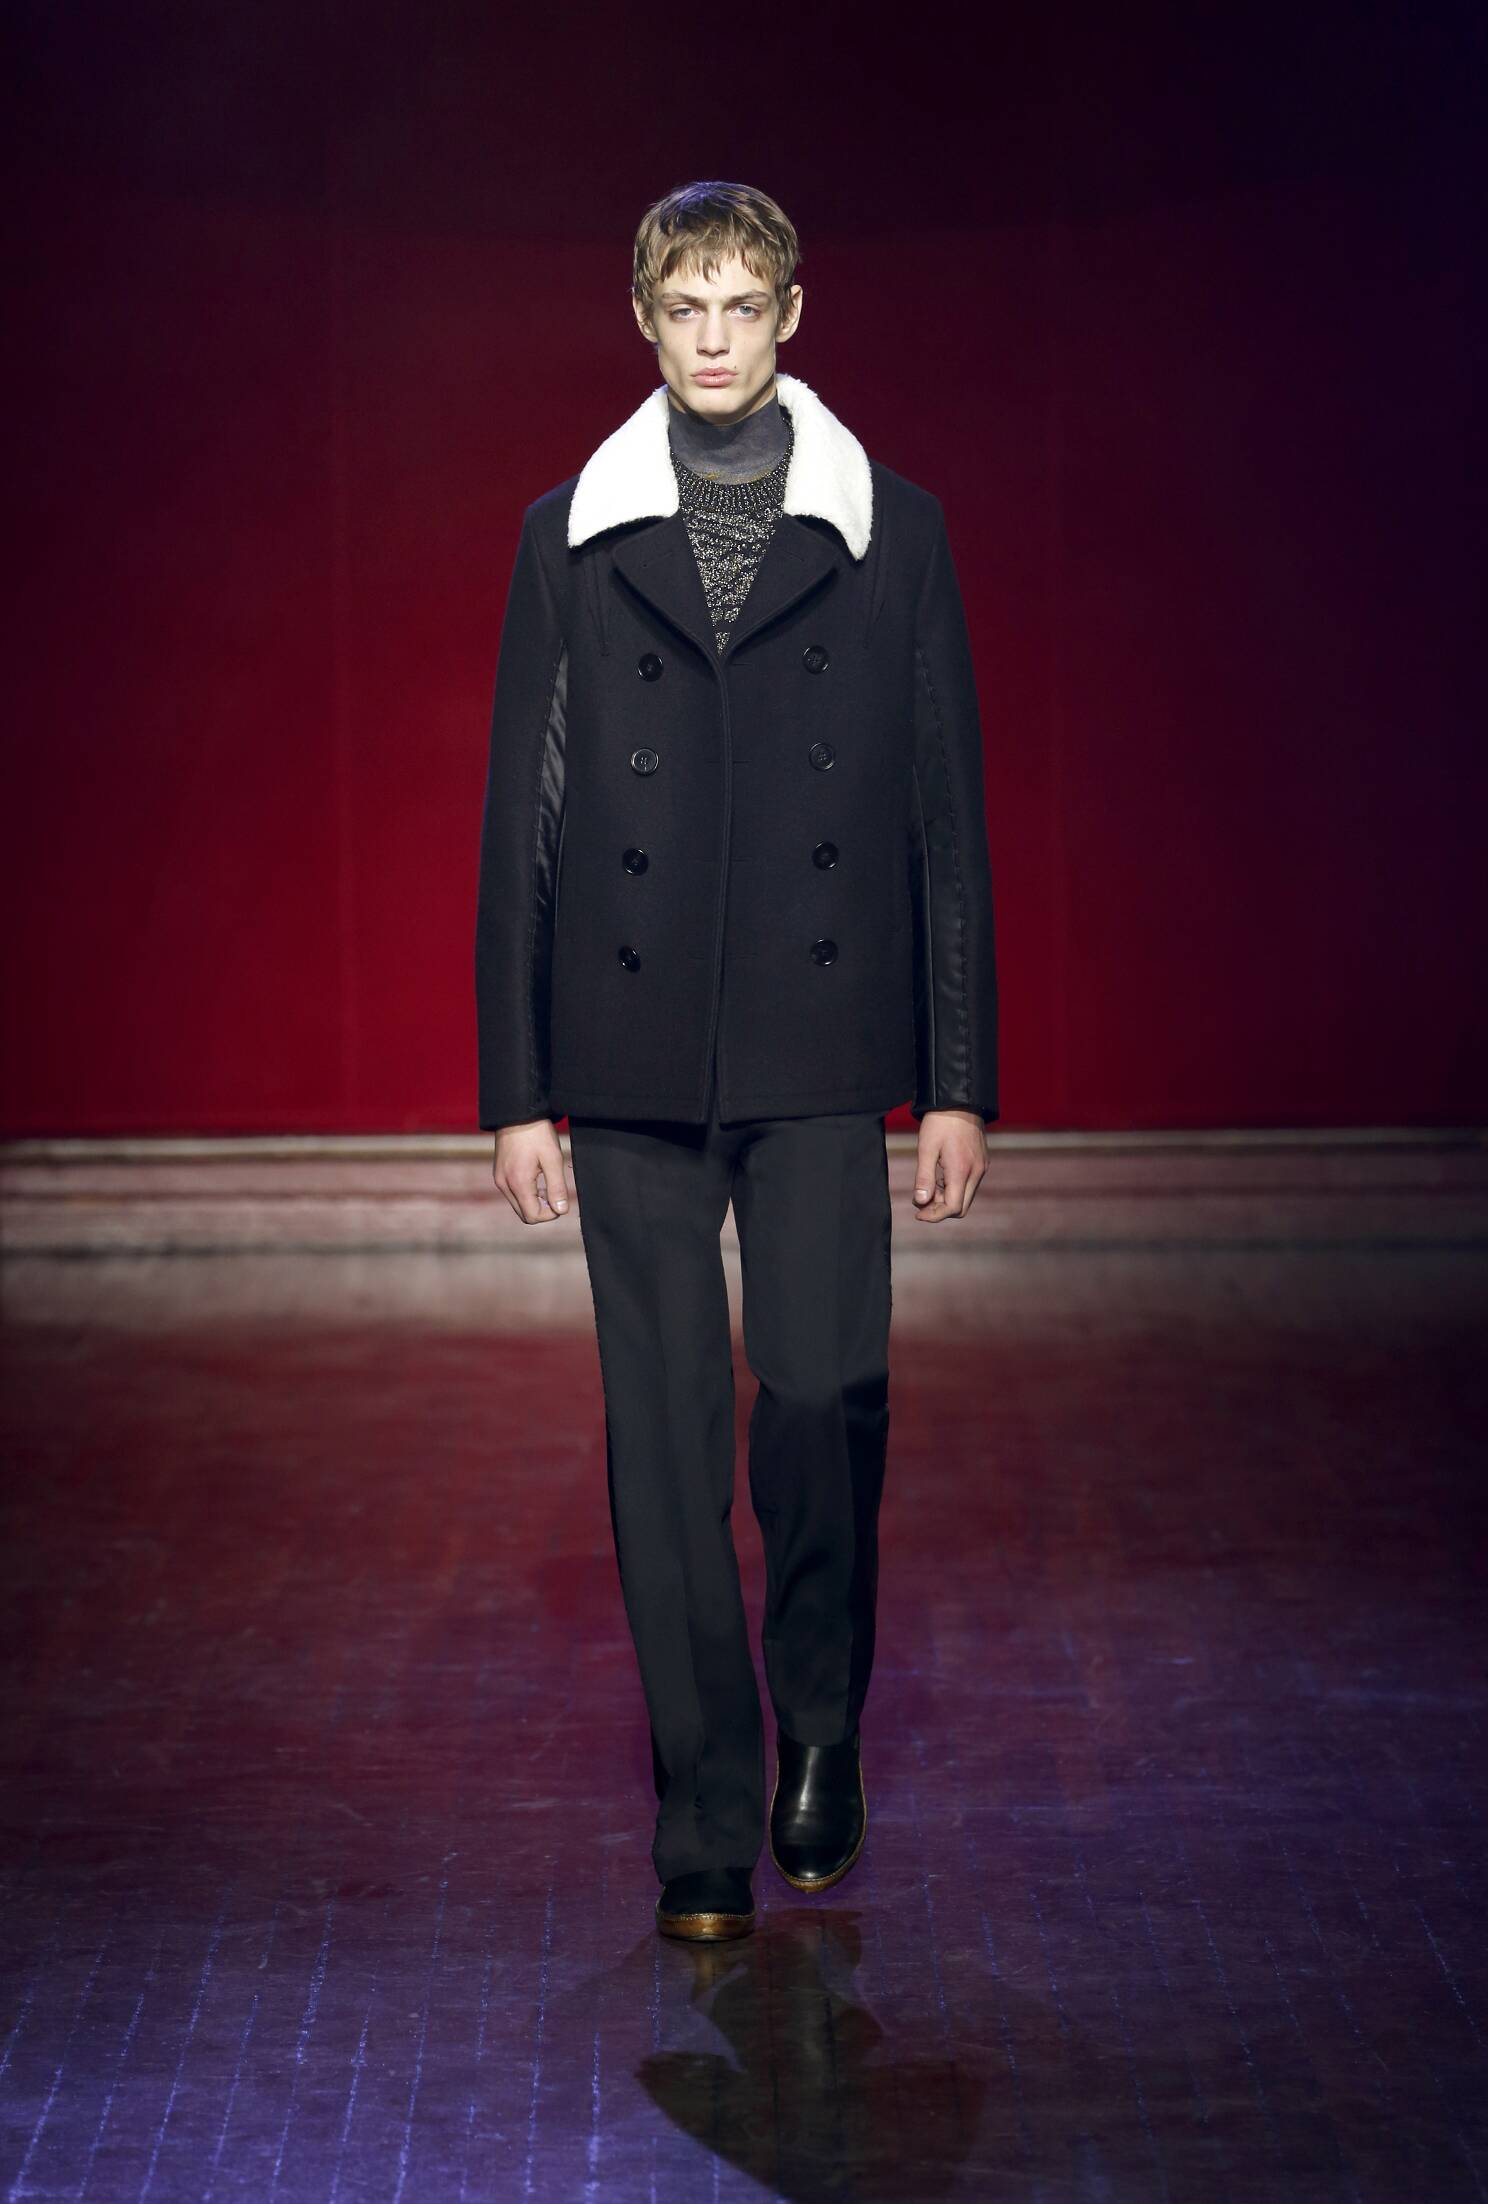 Winter 2015 Man Trends Maison Margiela Collection